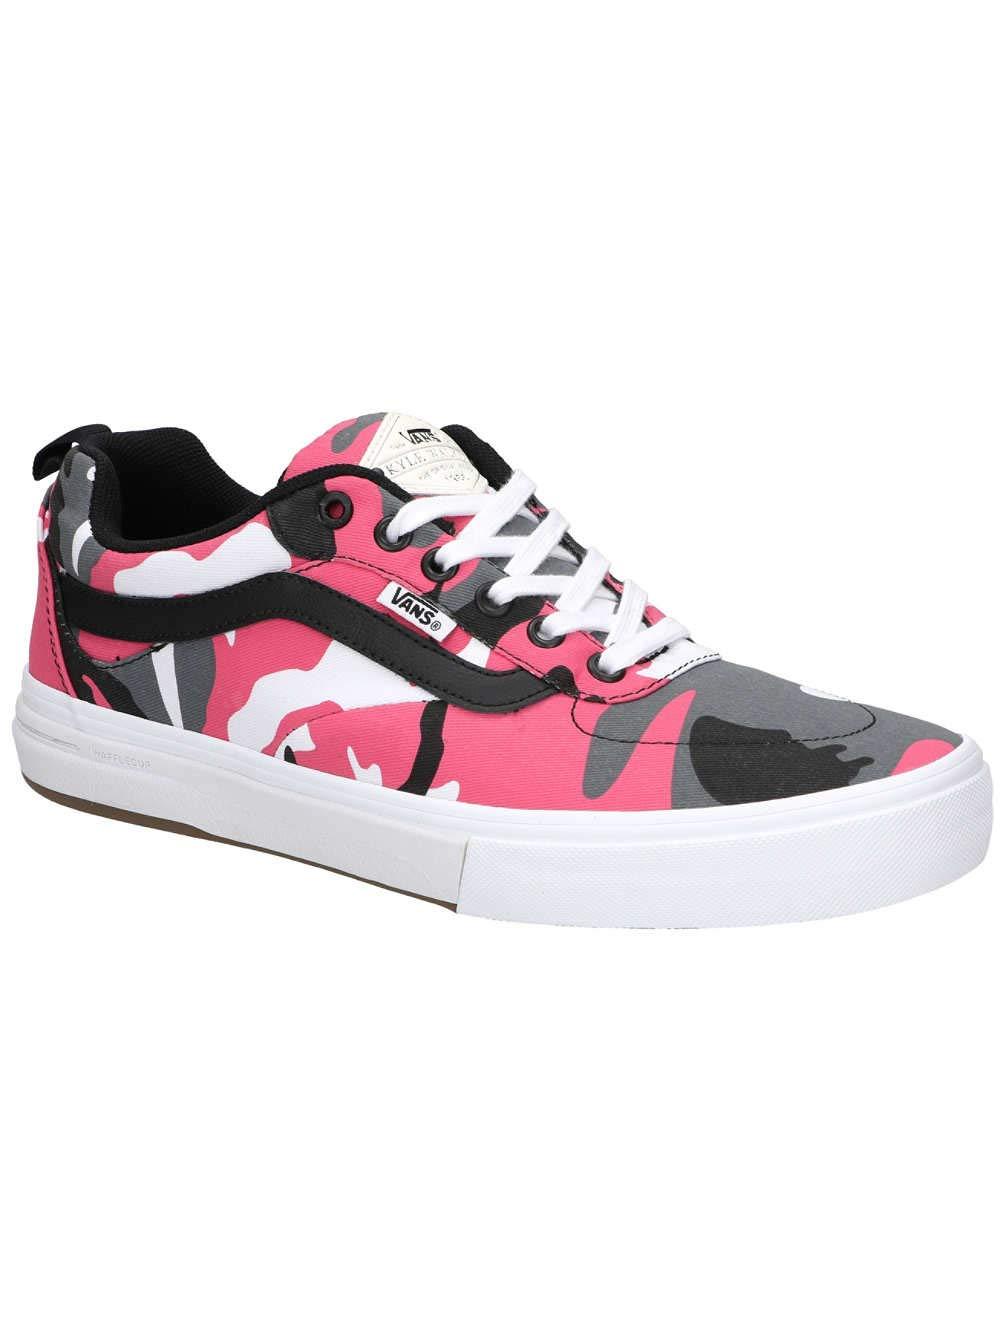 newest special sales cheap sale Vans Kyle Walker Camouflage Pro Skateboard Shoe - Black/Magenta (8.5)